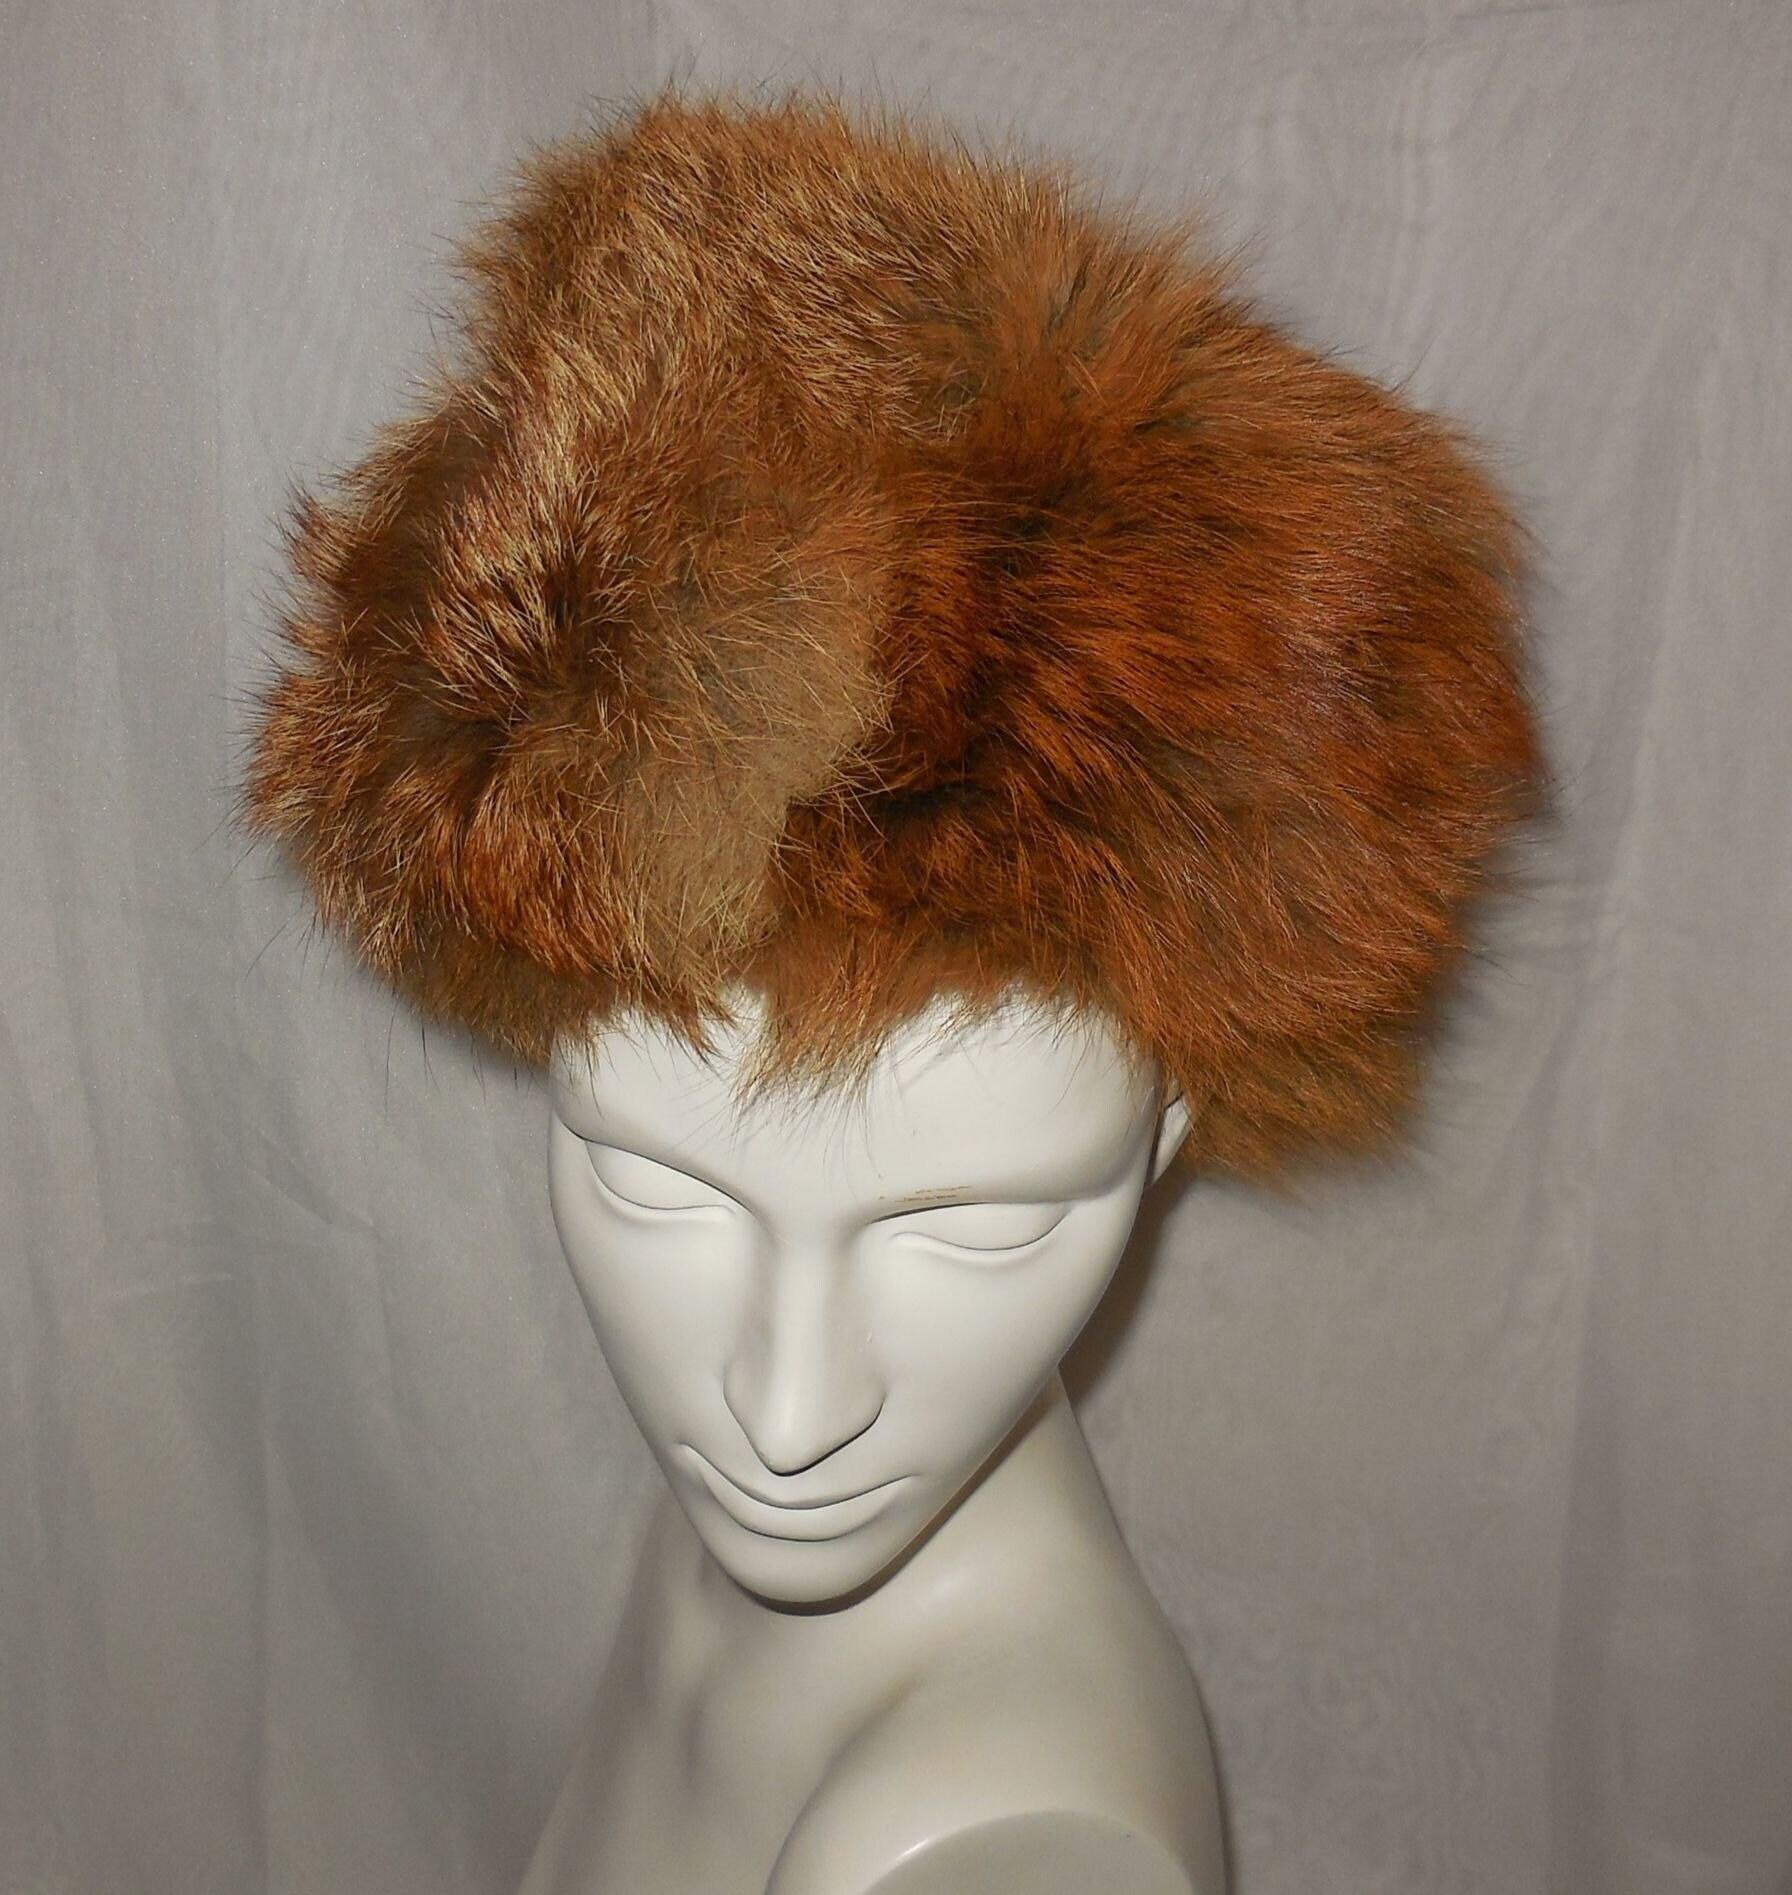 Vintage Fur Hat 1960s 70s Red Fox Fur Fluffy Round Pouf Hat Mod Apres Ski  Boho 21.5 inches 67965f37ce8